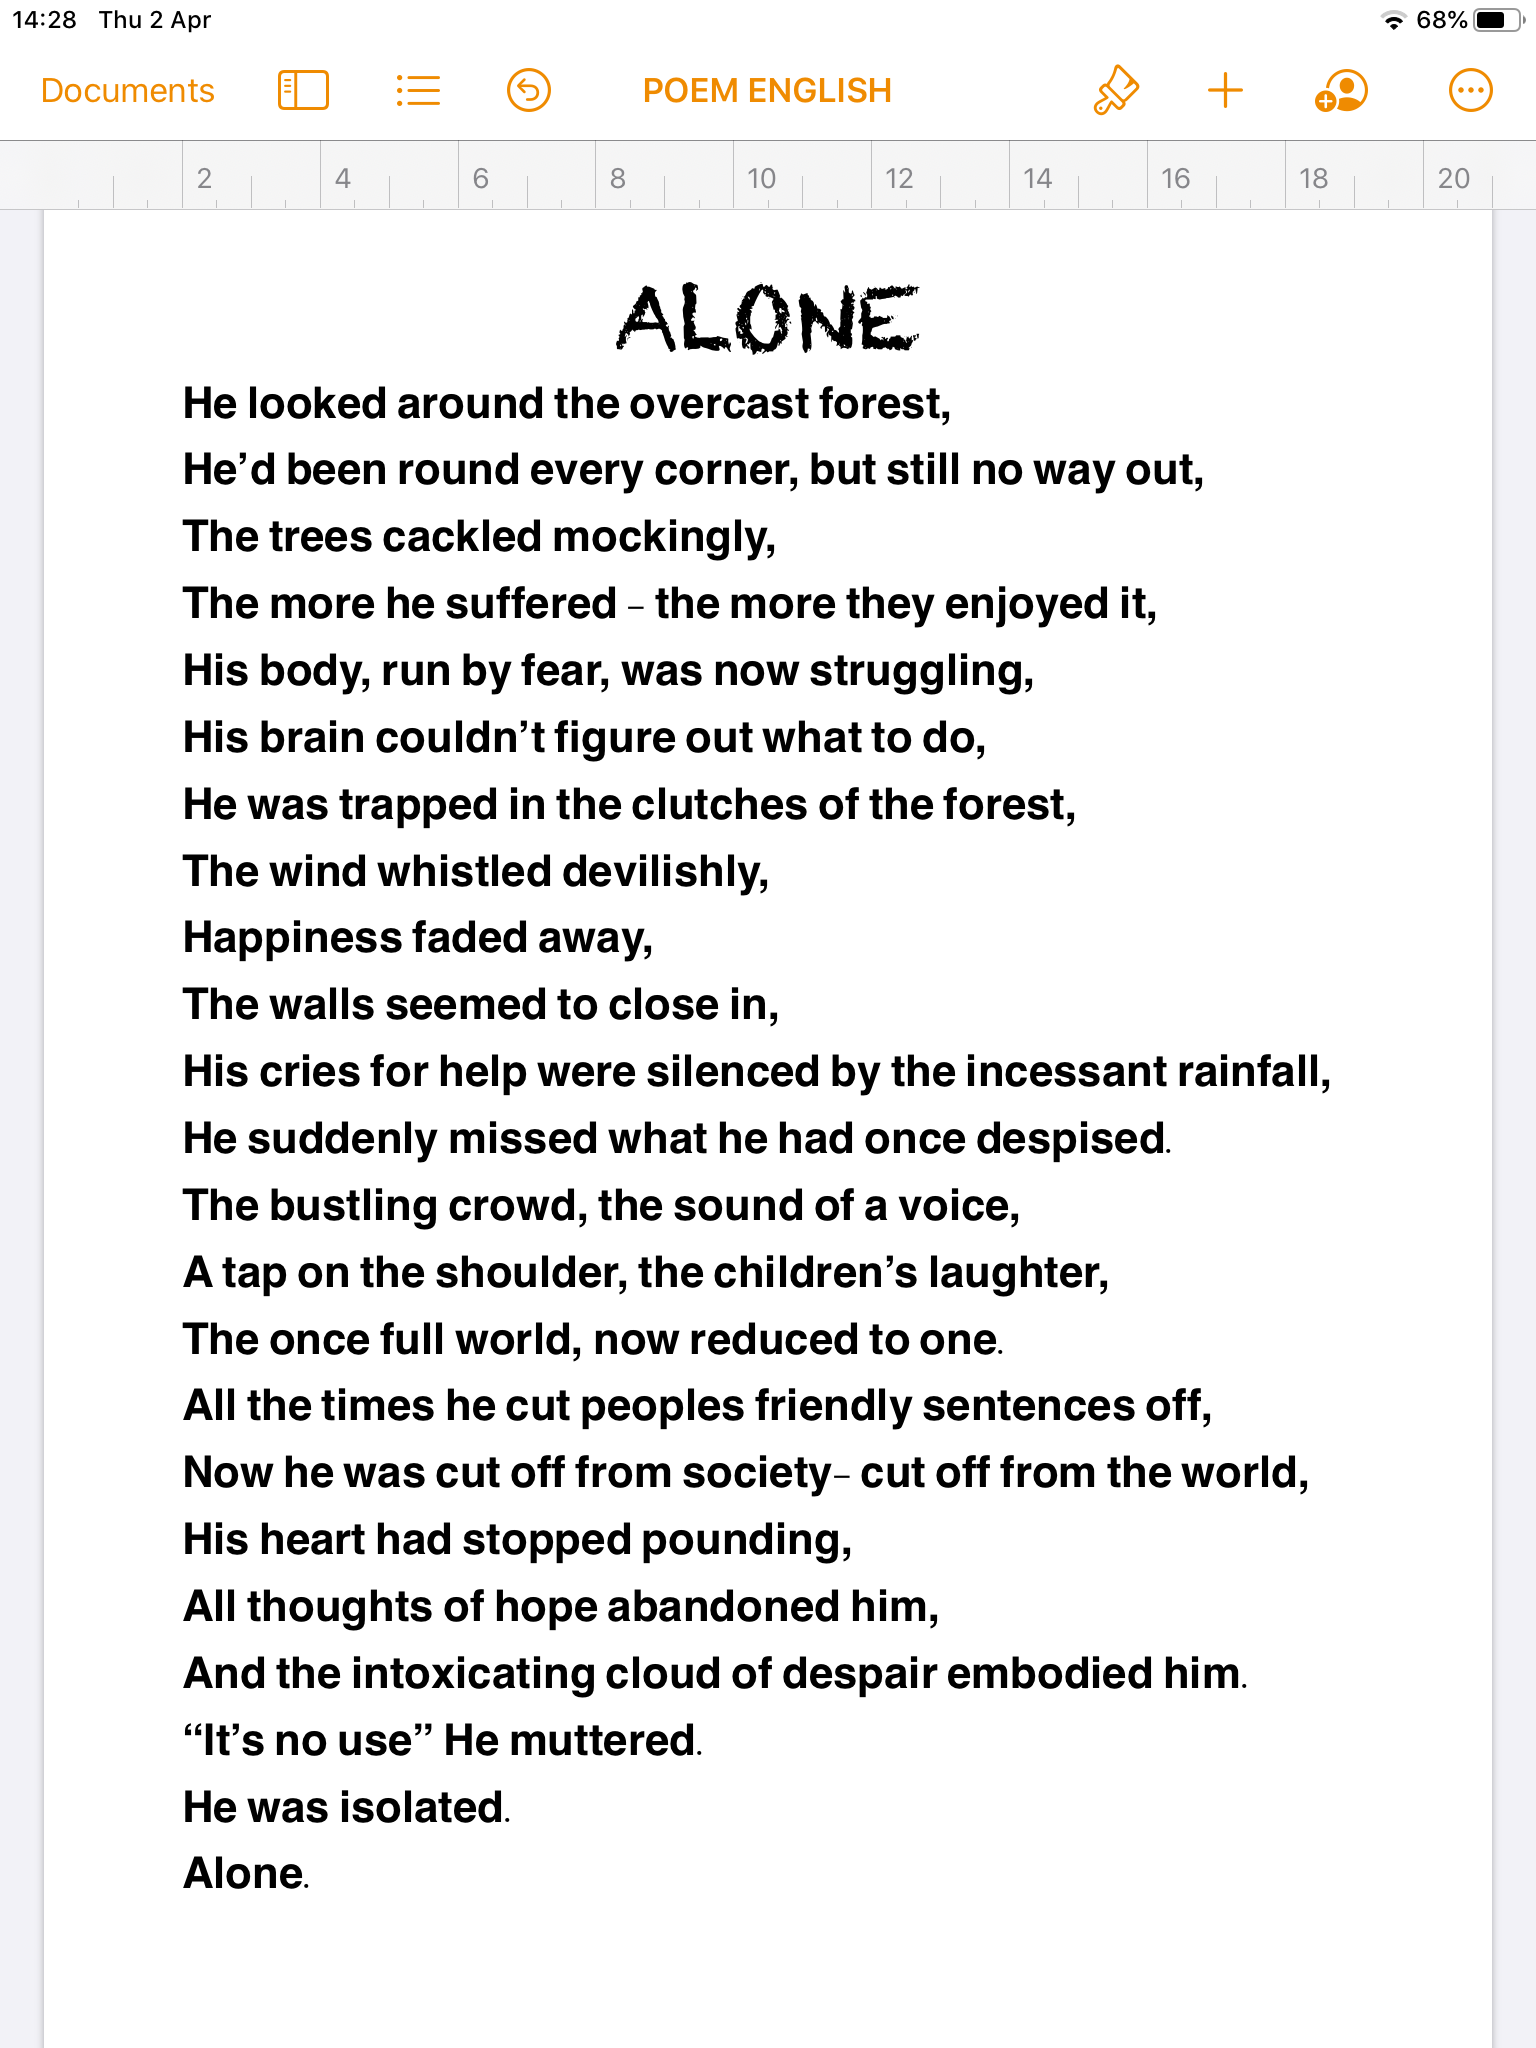 27/04/20 - Alone